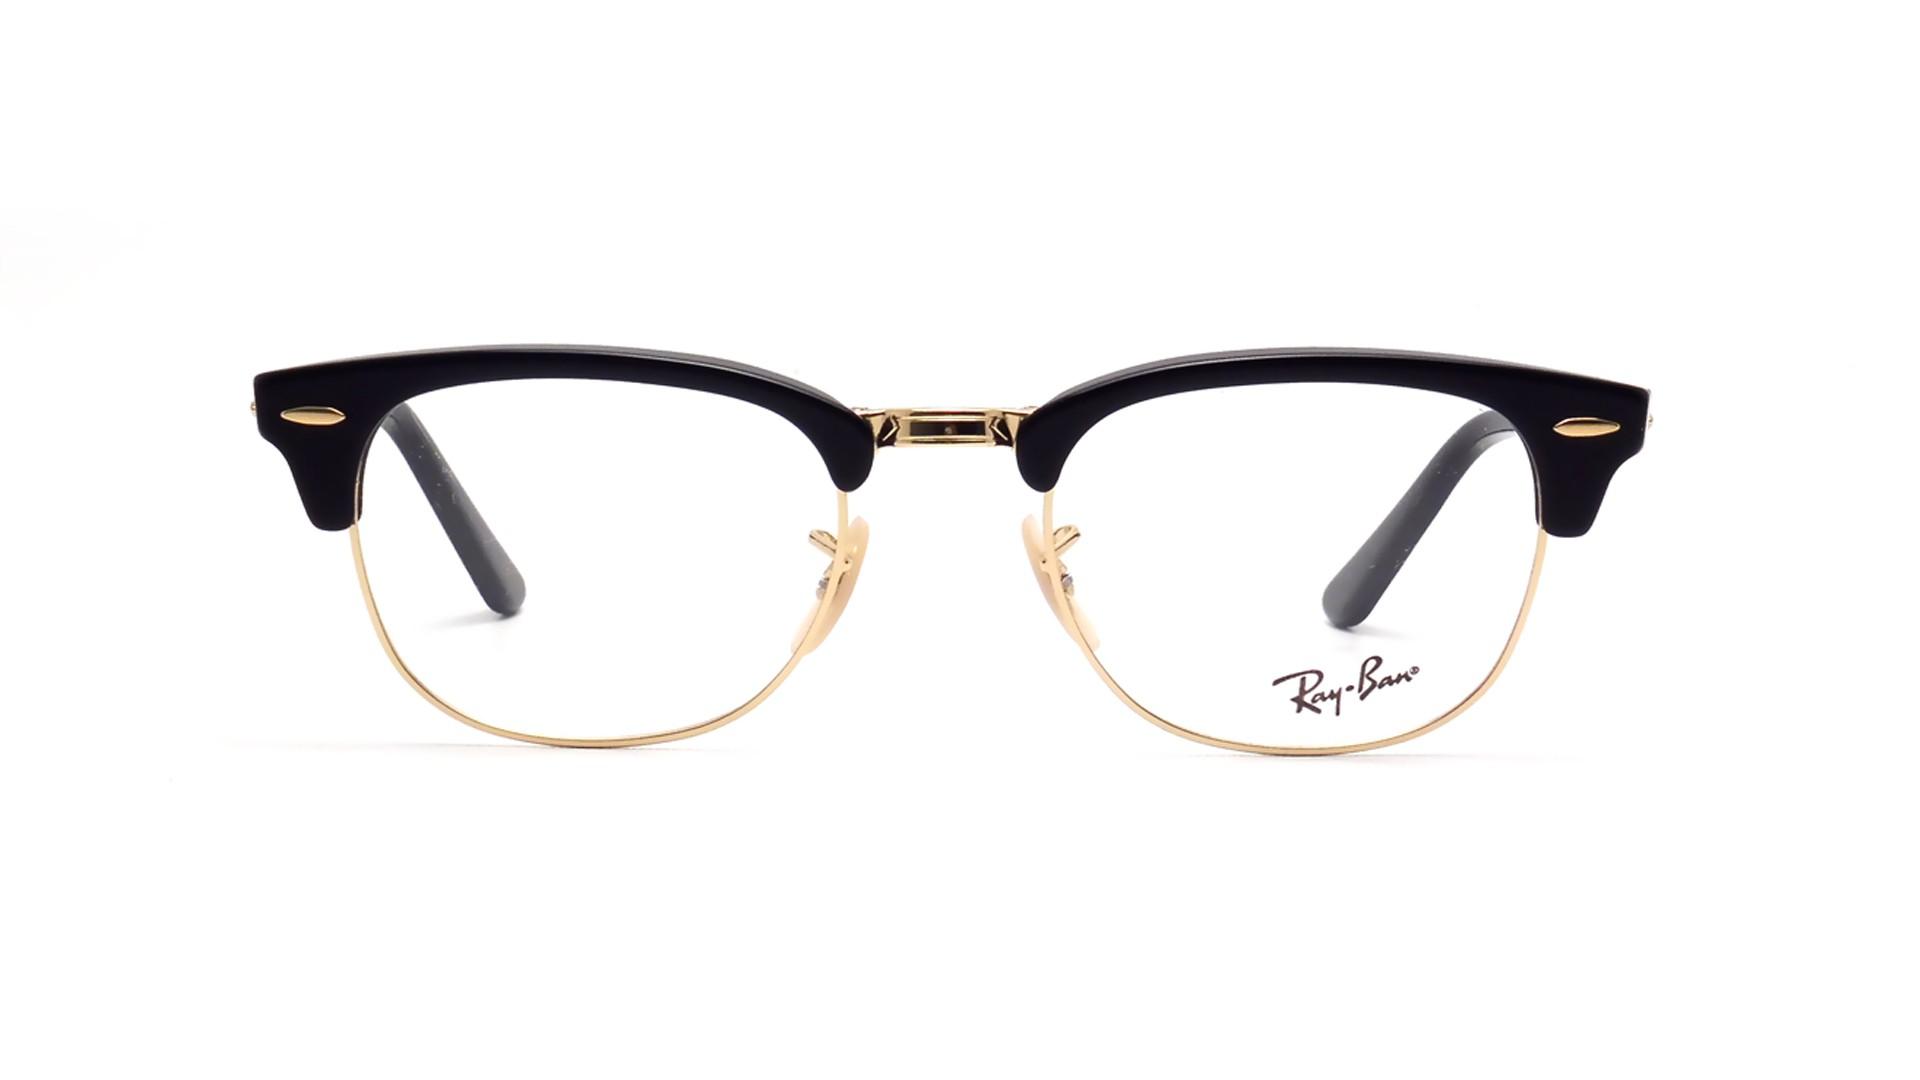 Ray Ban Clubmaster Glasses Black